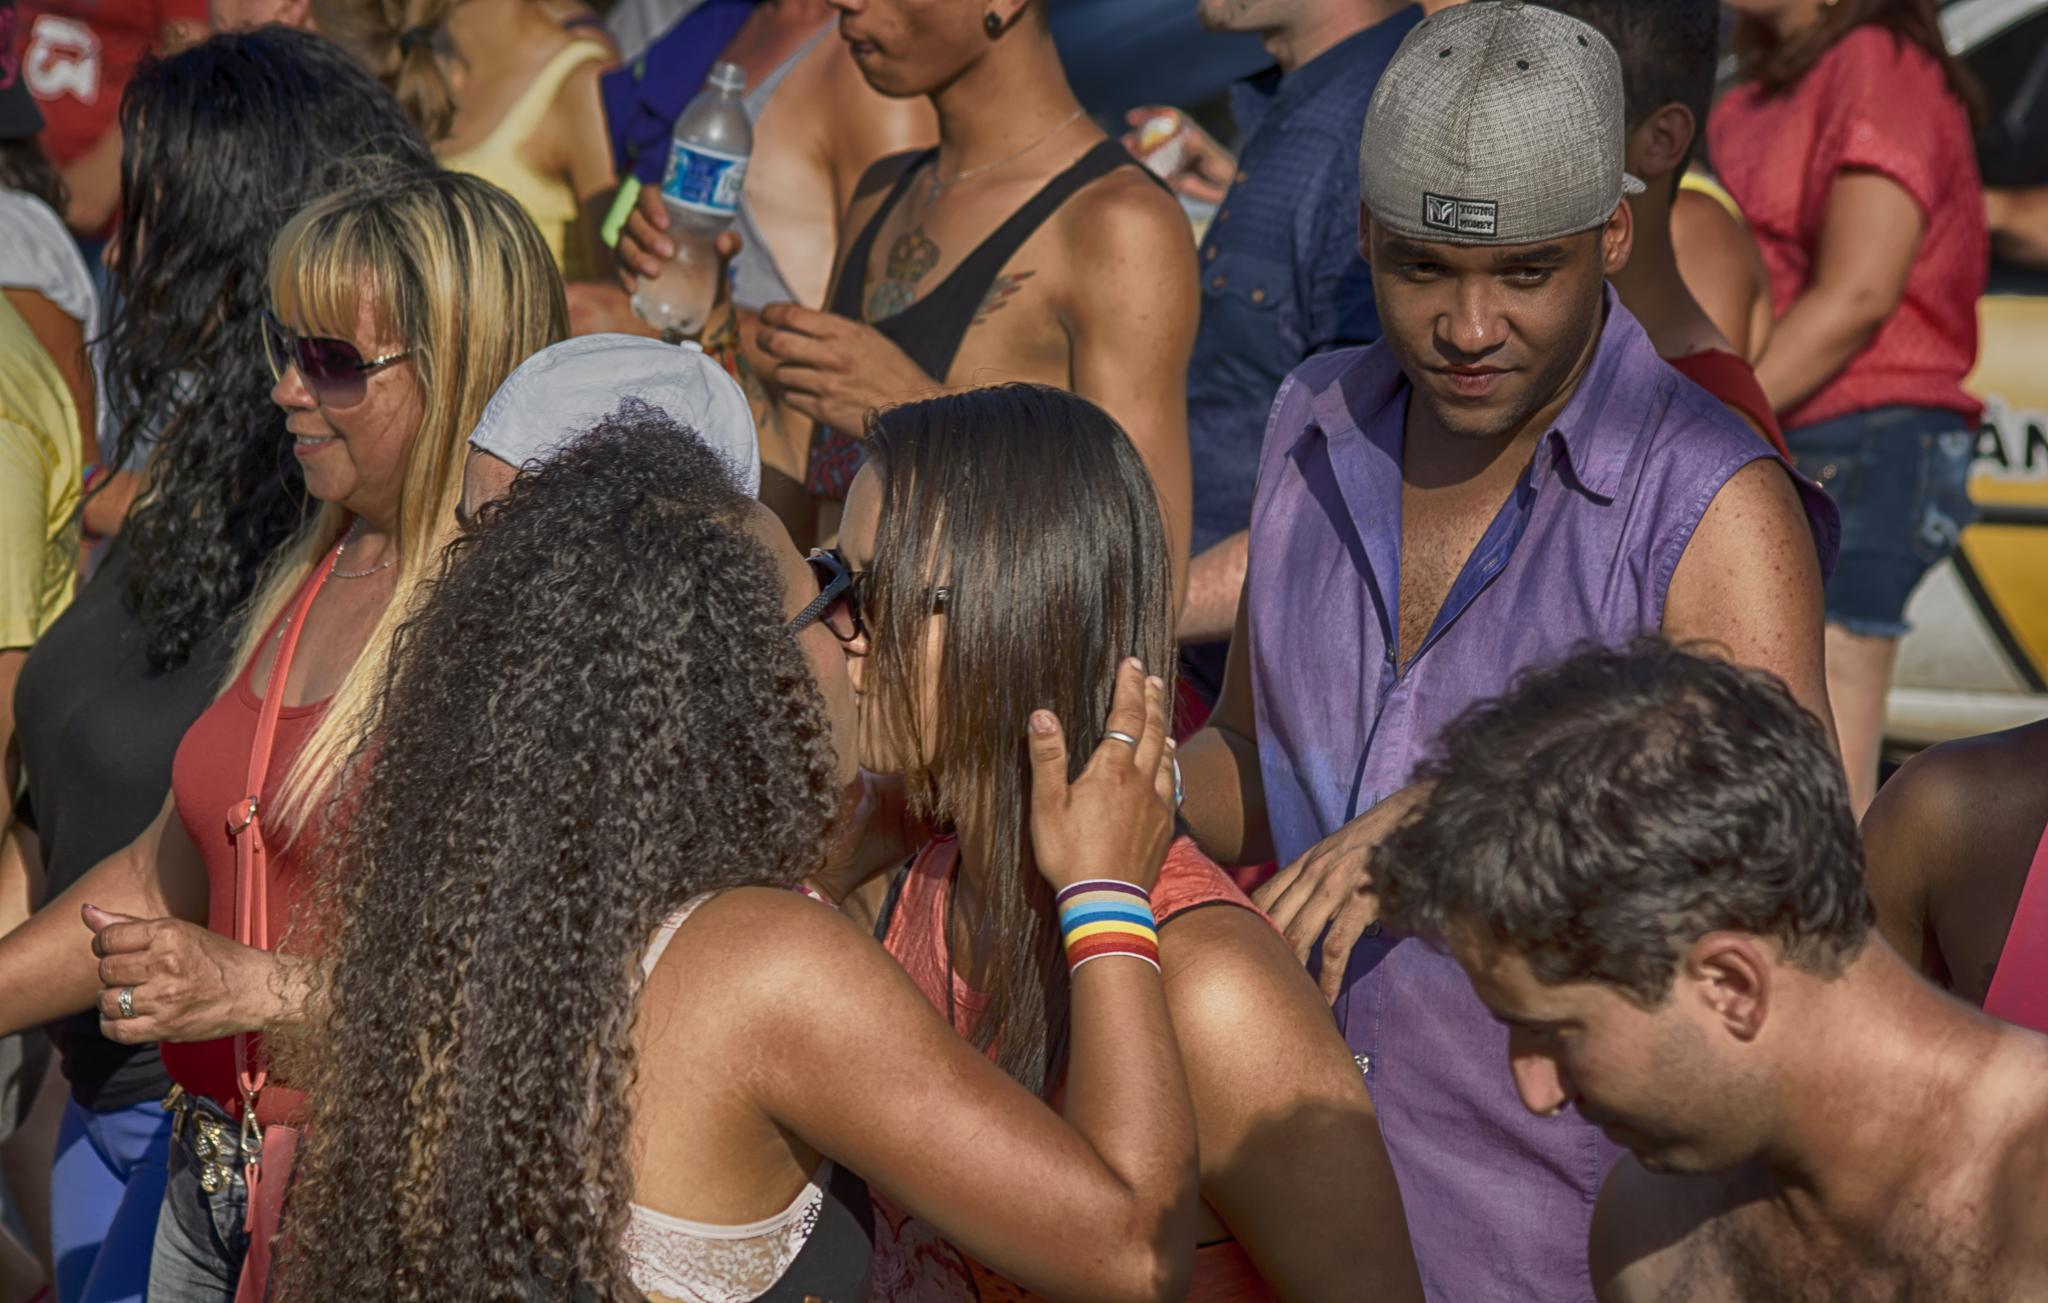 Beijo na multidão/Beso en la multidud/Kiss in the crowd by Jose Liborio